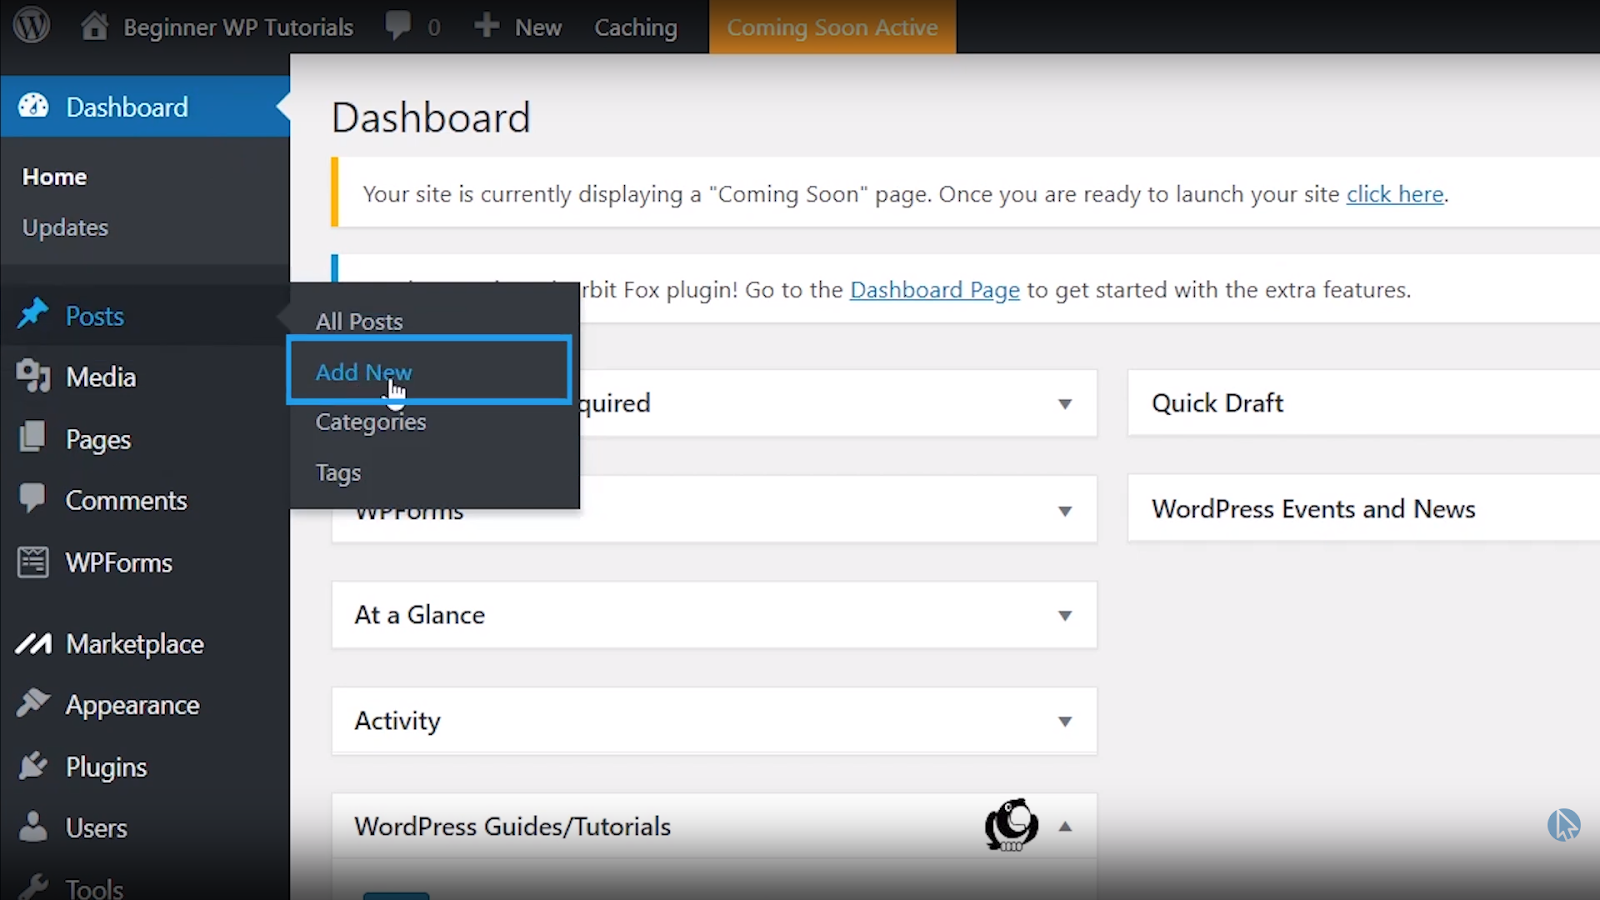 add new blog post wordpress tutorial for beginners